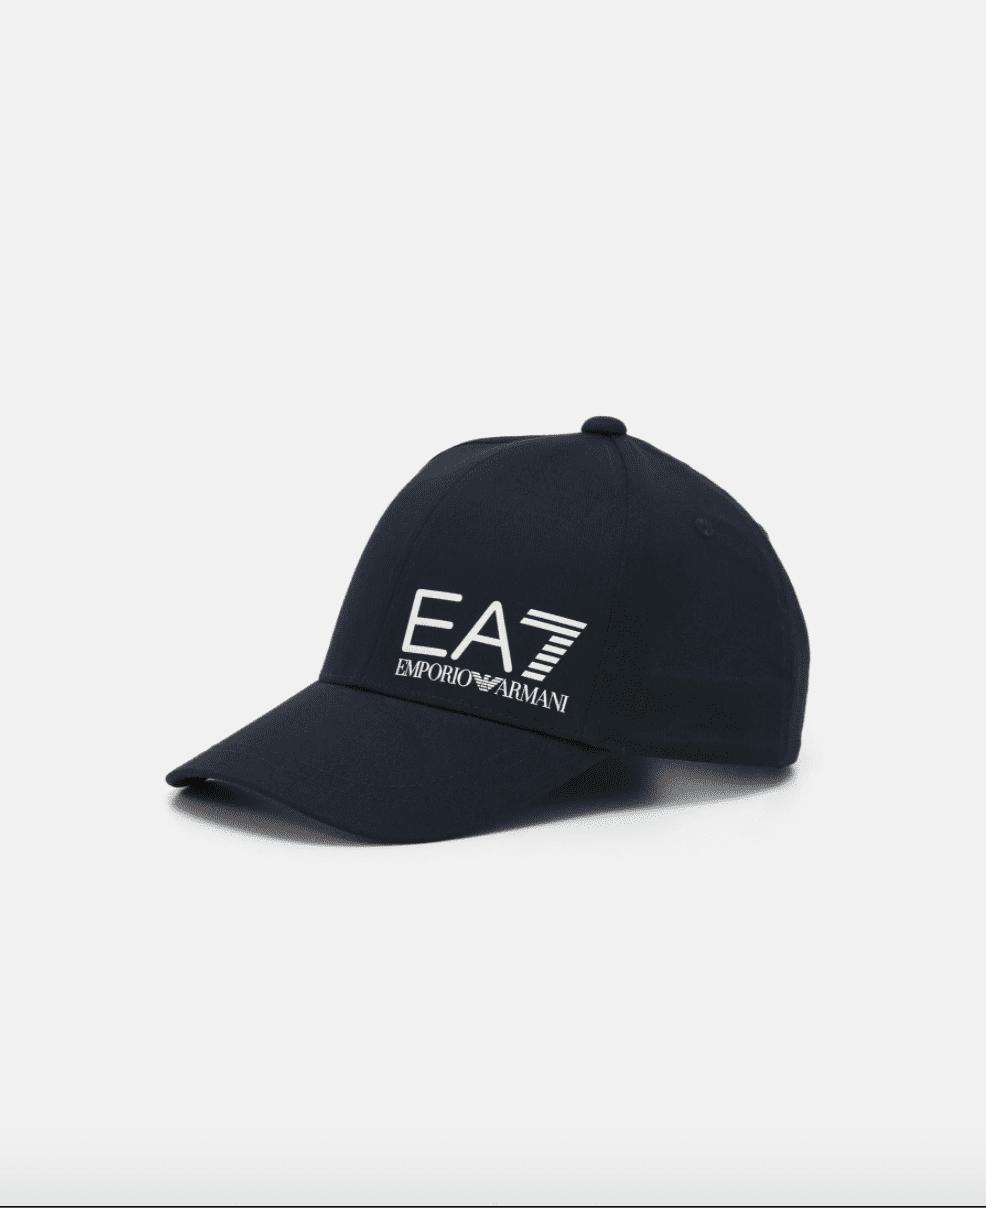 Armani EA7 Cap Donkerblauw